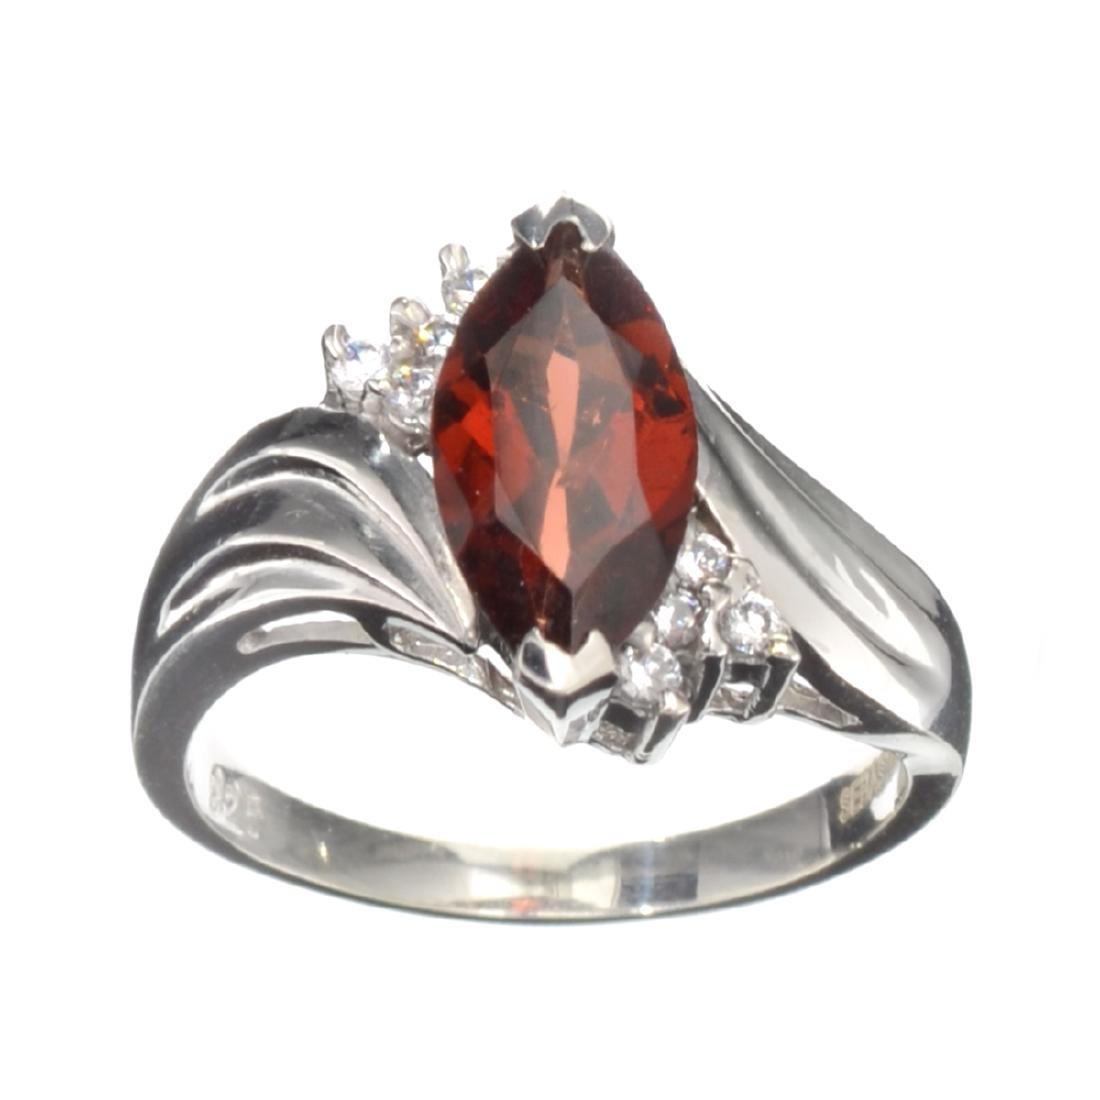 Fine Jewelry Designer Sebastian 2.42CT Almandite Garnet